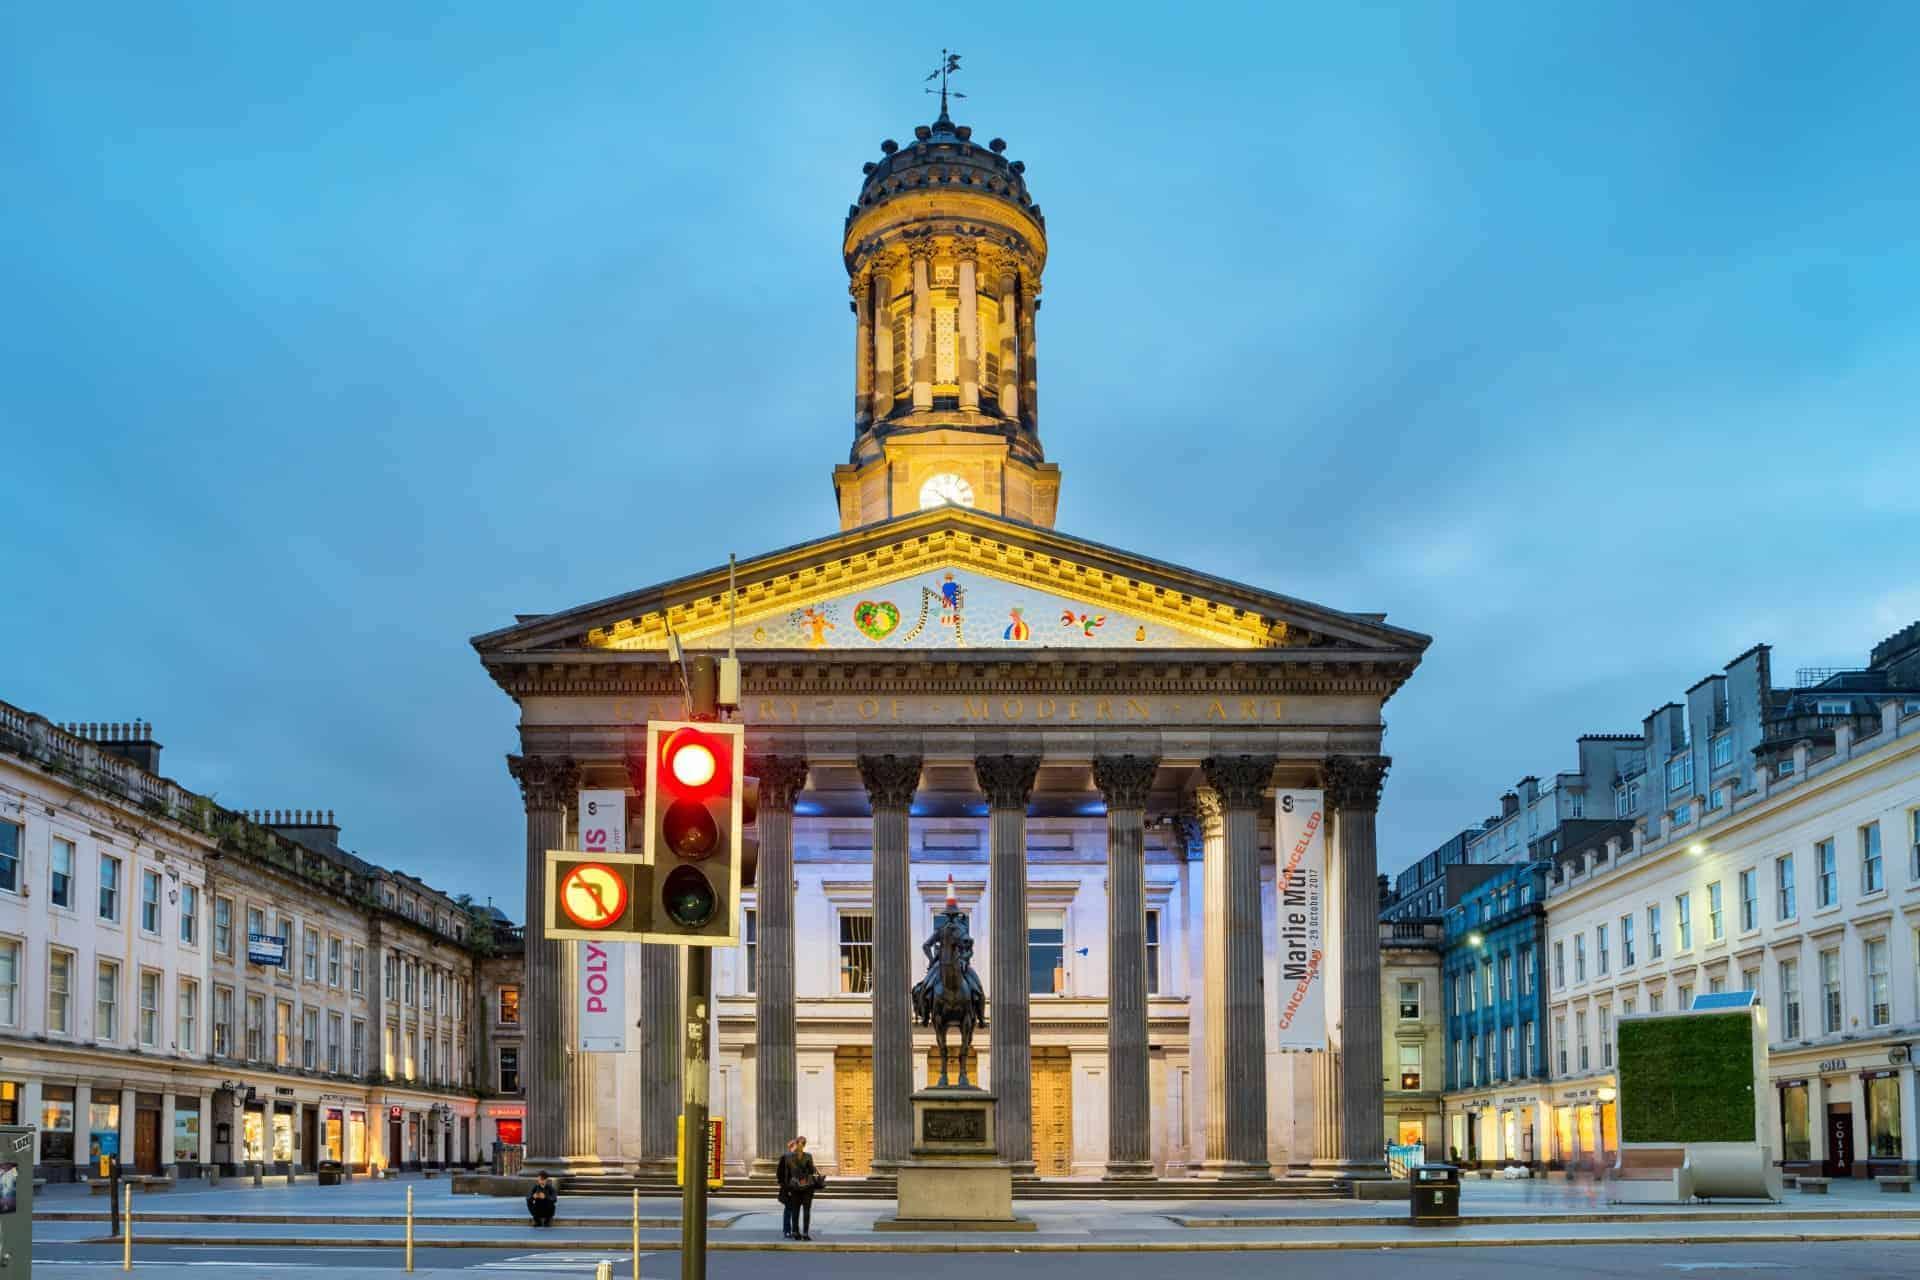 Glasgow's Gallery of Modern art